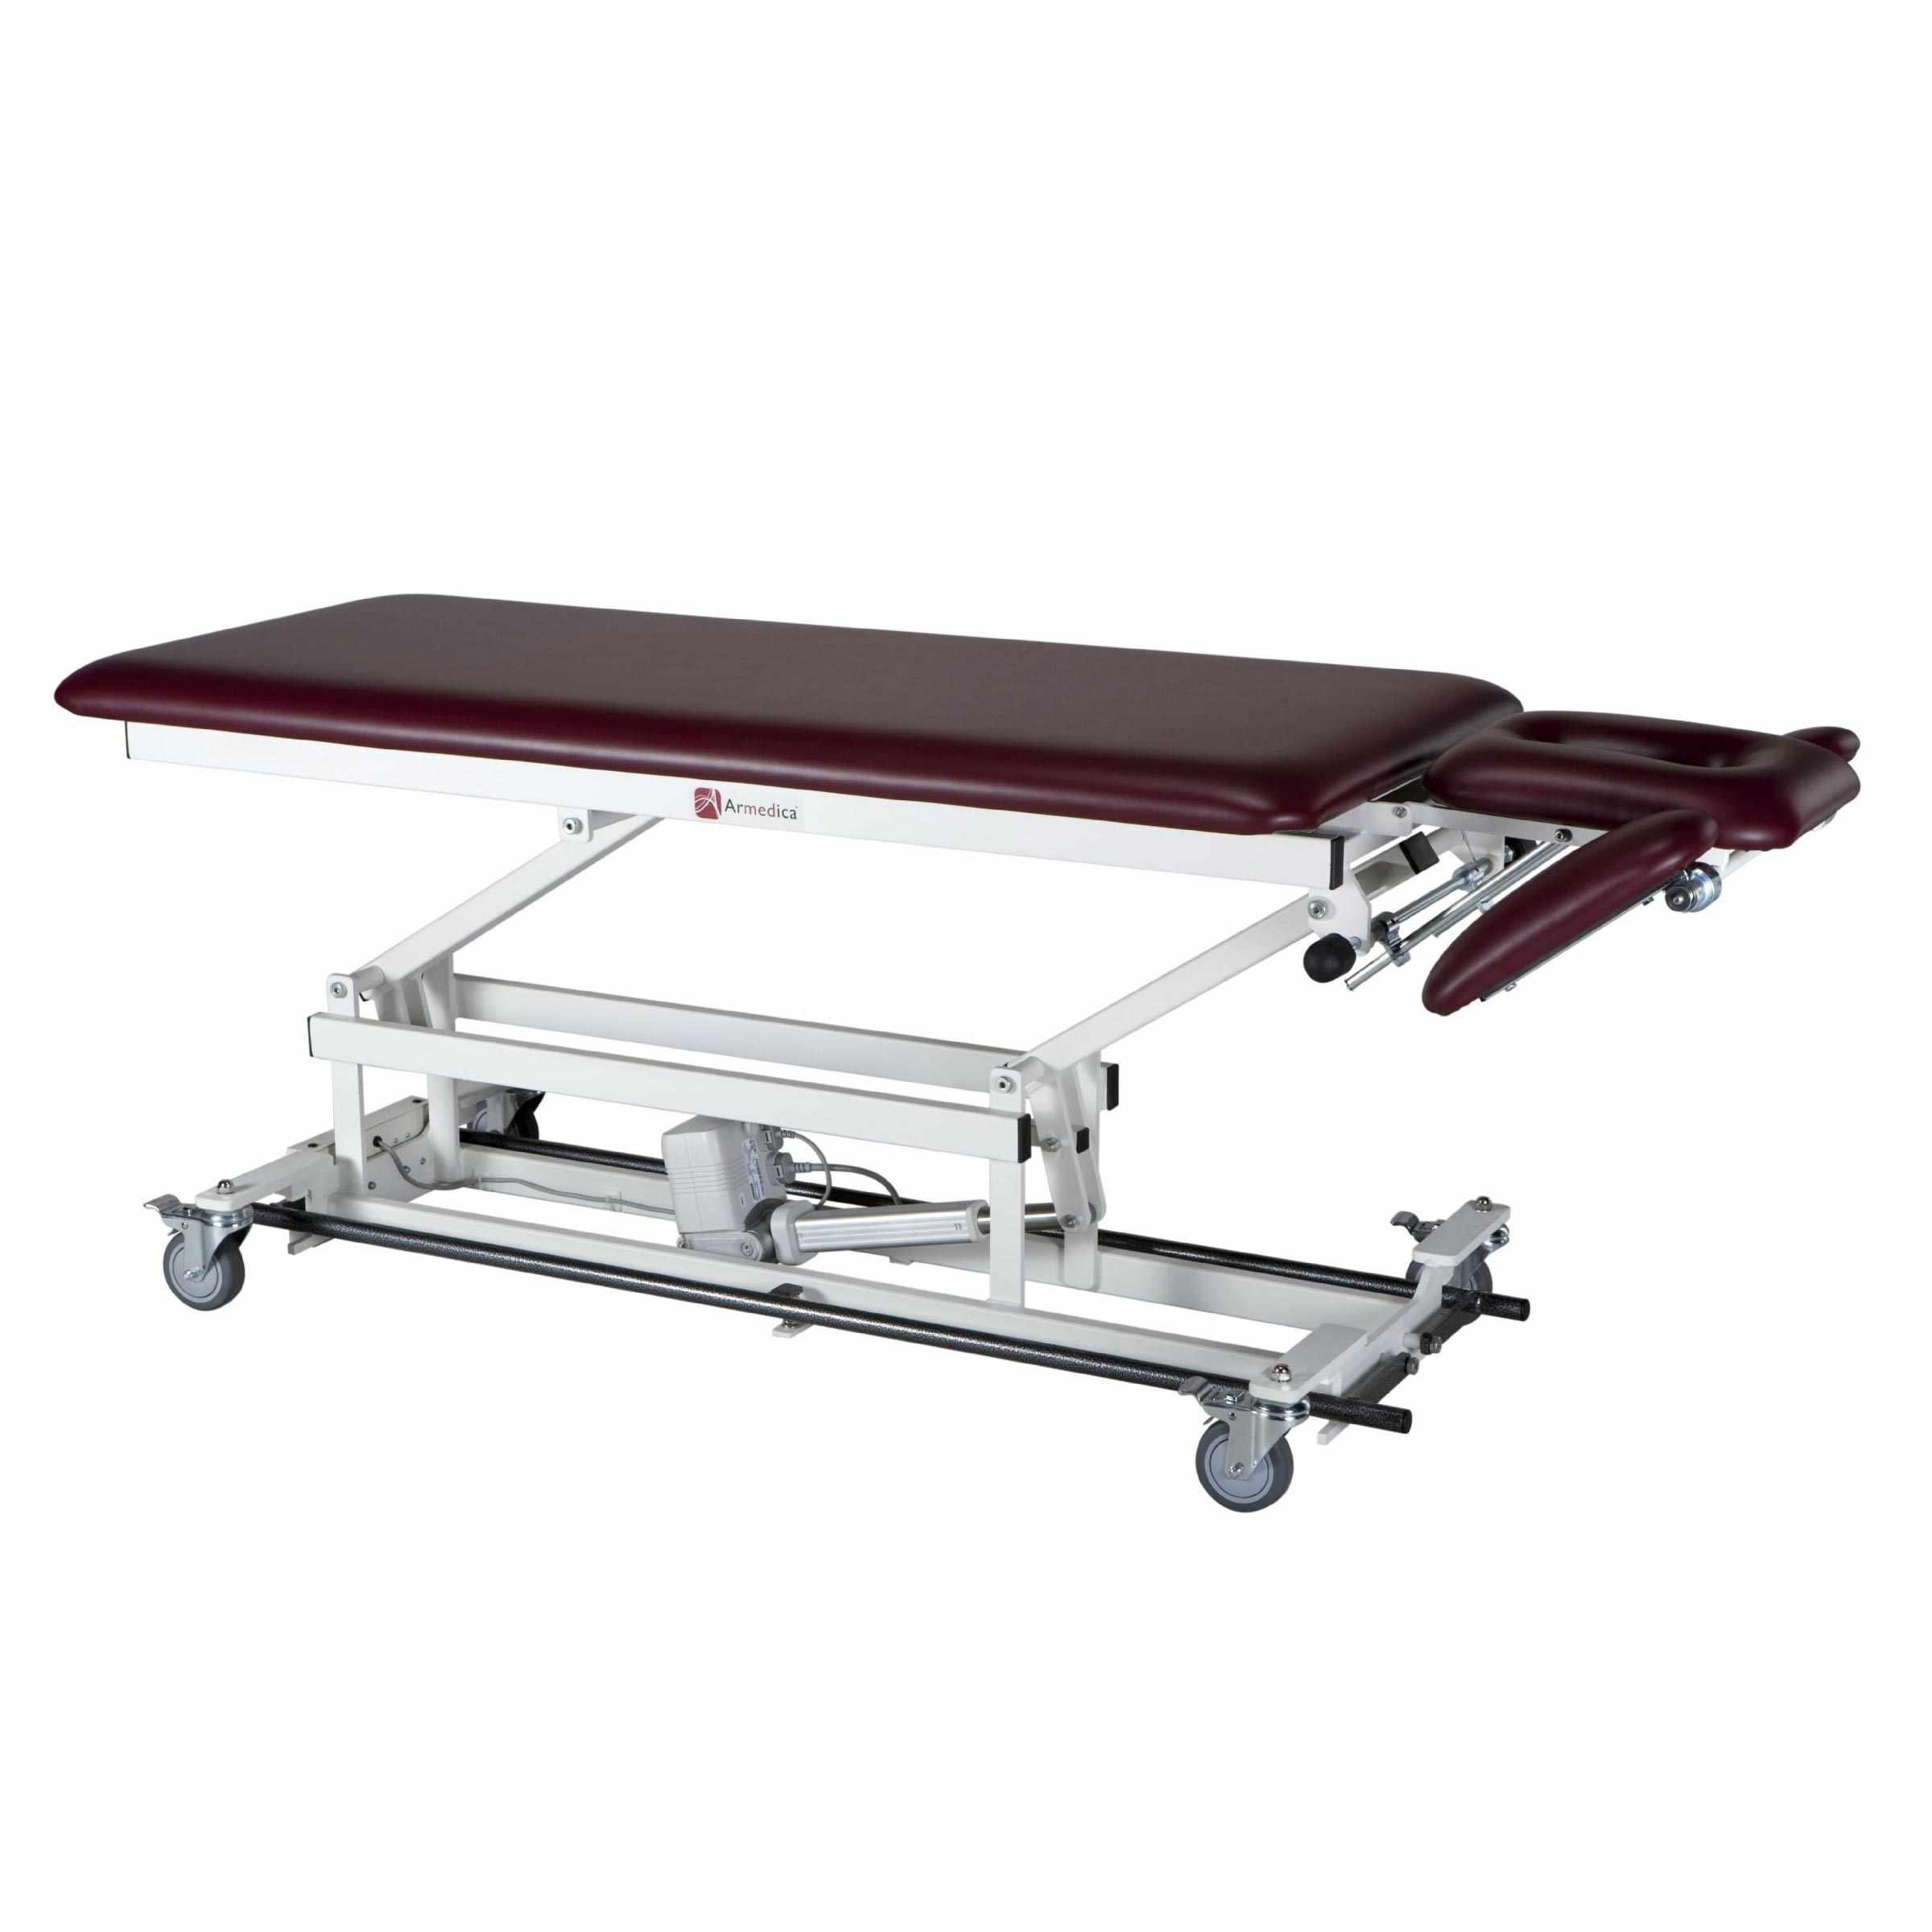 Armedica AM-BA 250 treatment table